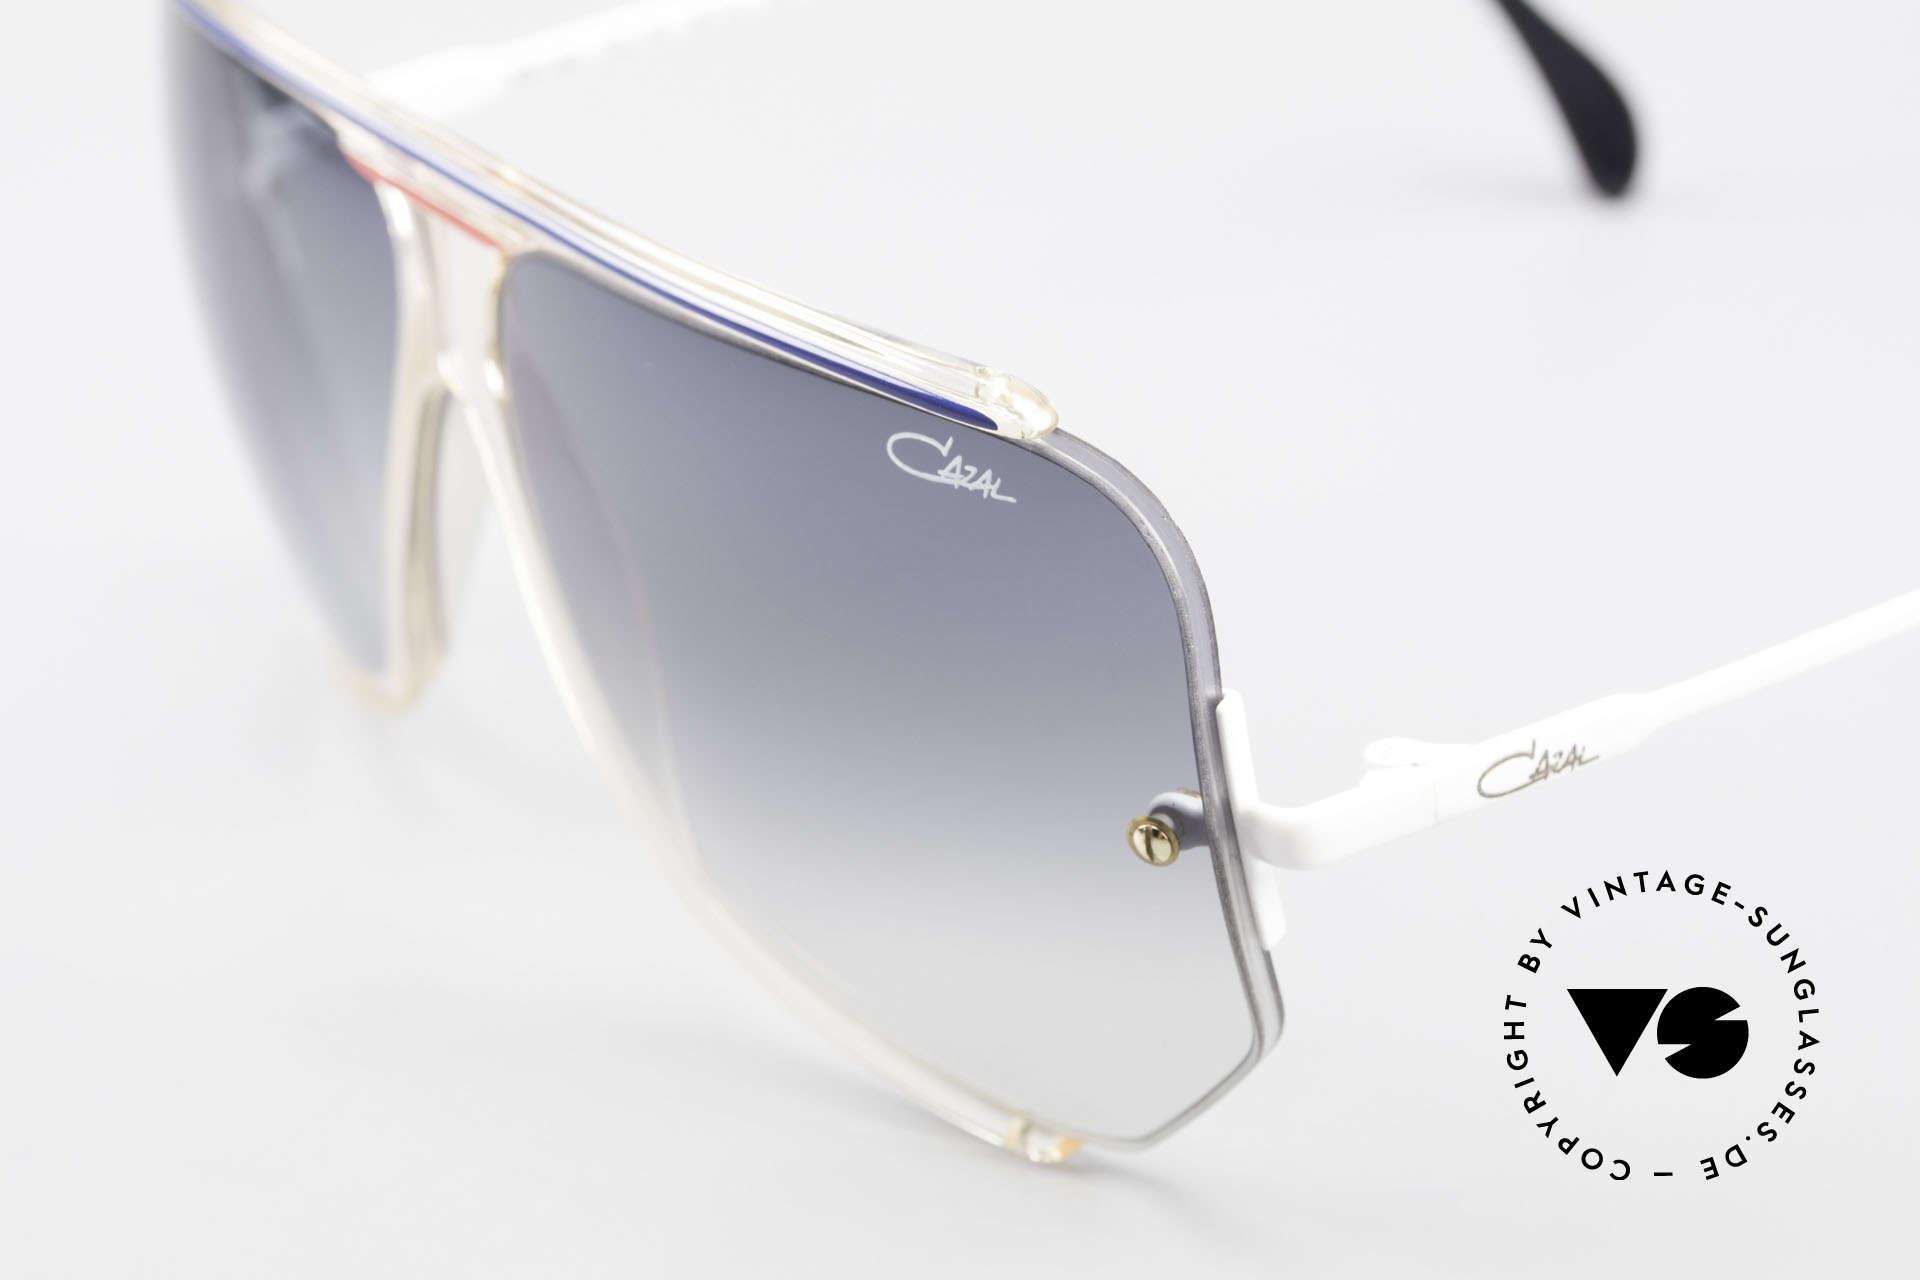 Cazal 850 Old School 80's Sunglasses, Cazals interpretation of the ordinary 'pilots-style', Made for Men